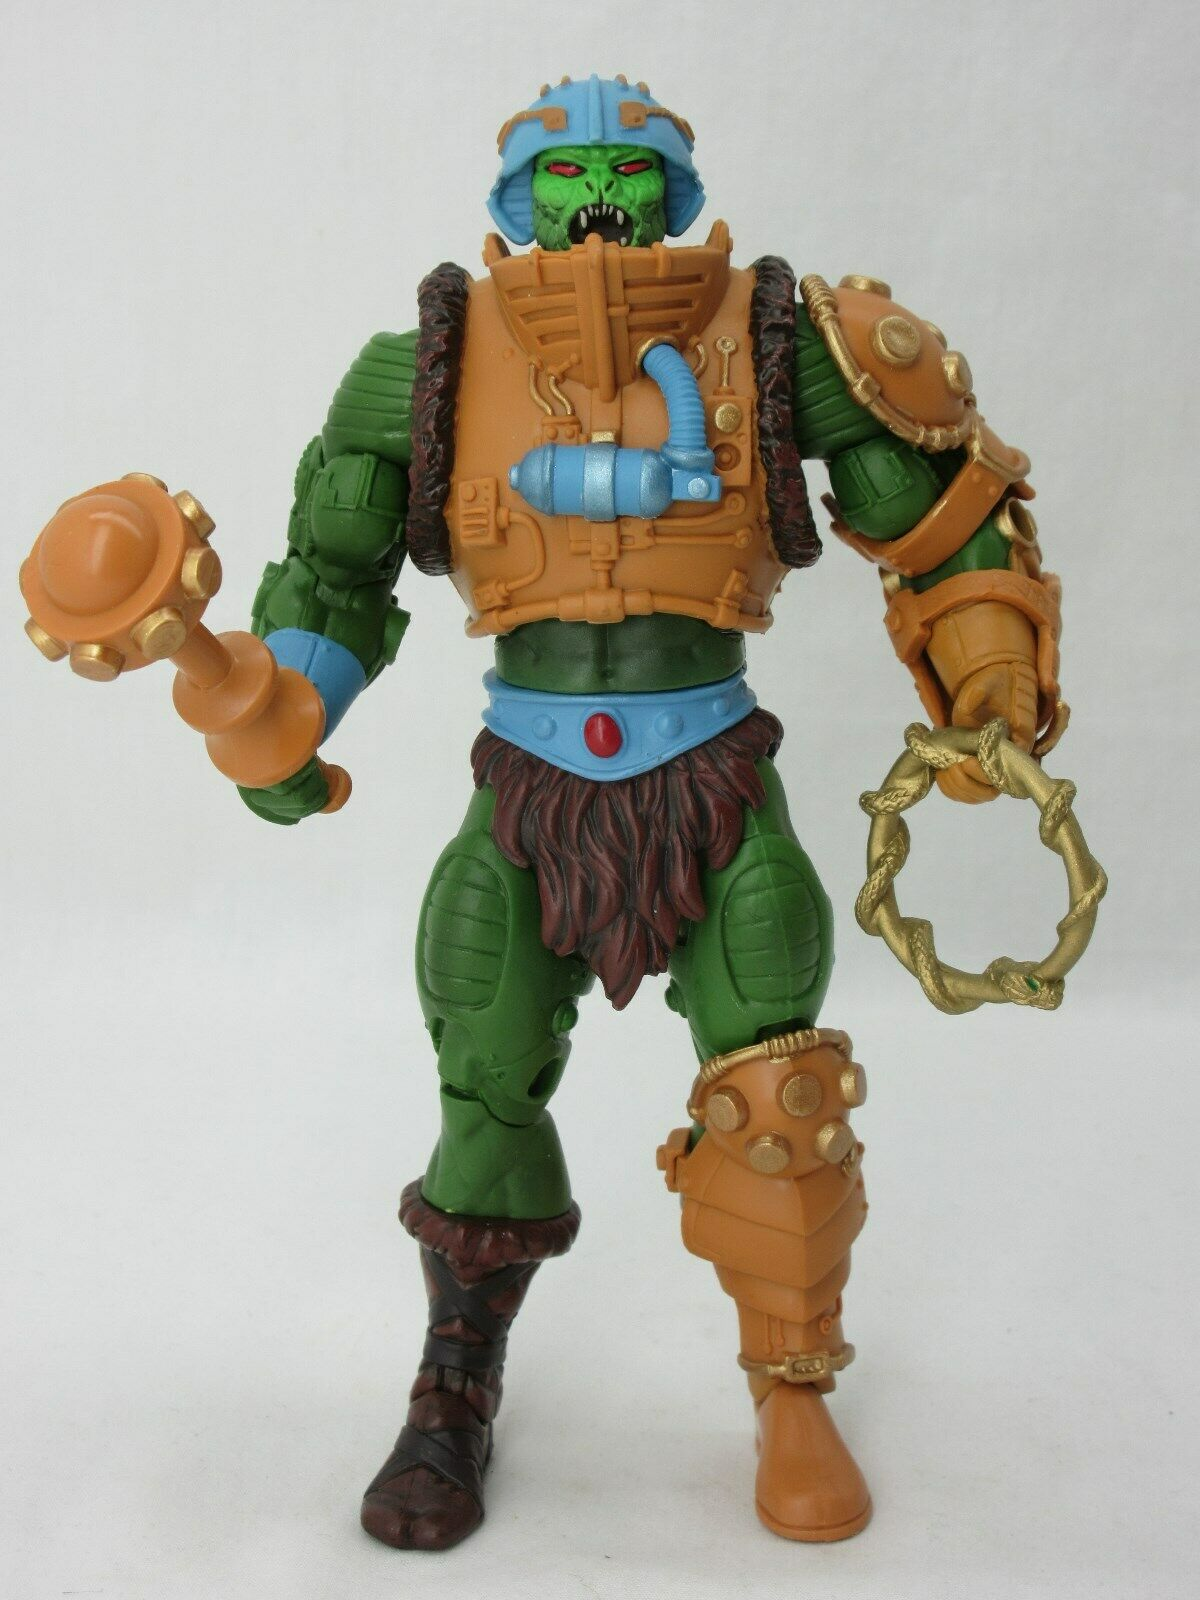 MOTUC,MOTU,SNAKE MAN-AT-ARMS,Masters MAN-AT-ARMS,Masters MAN-AT-ARMS,Masters Of The Universe Classics,Complete,He man  ecd7f9